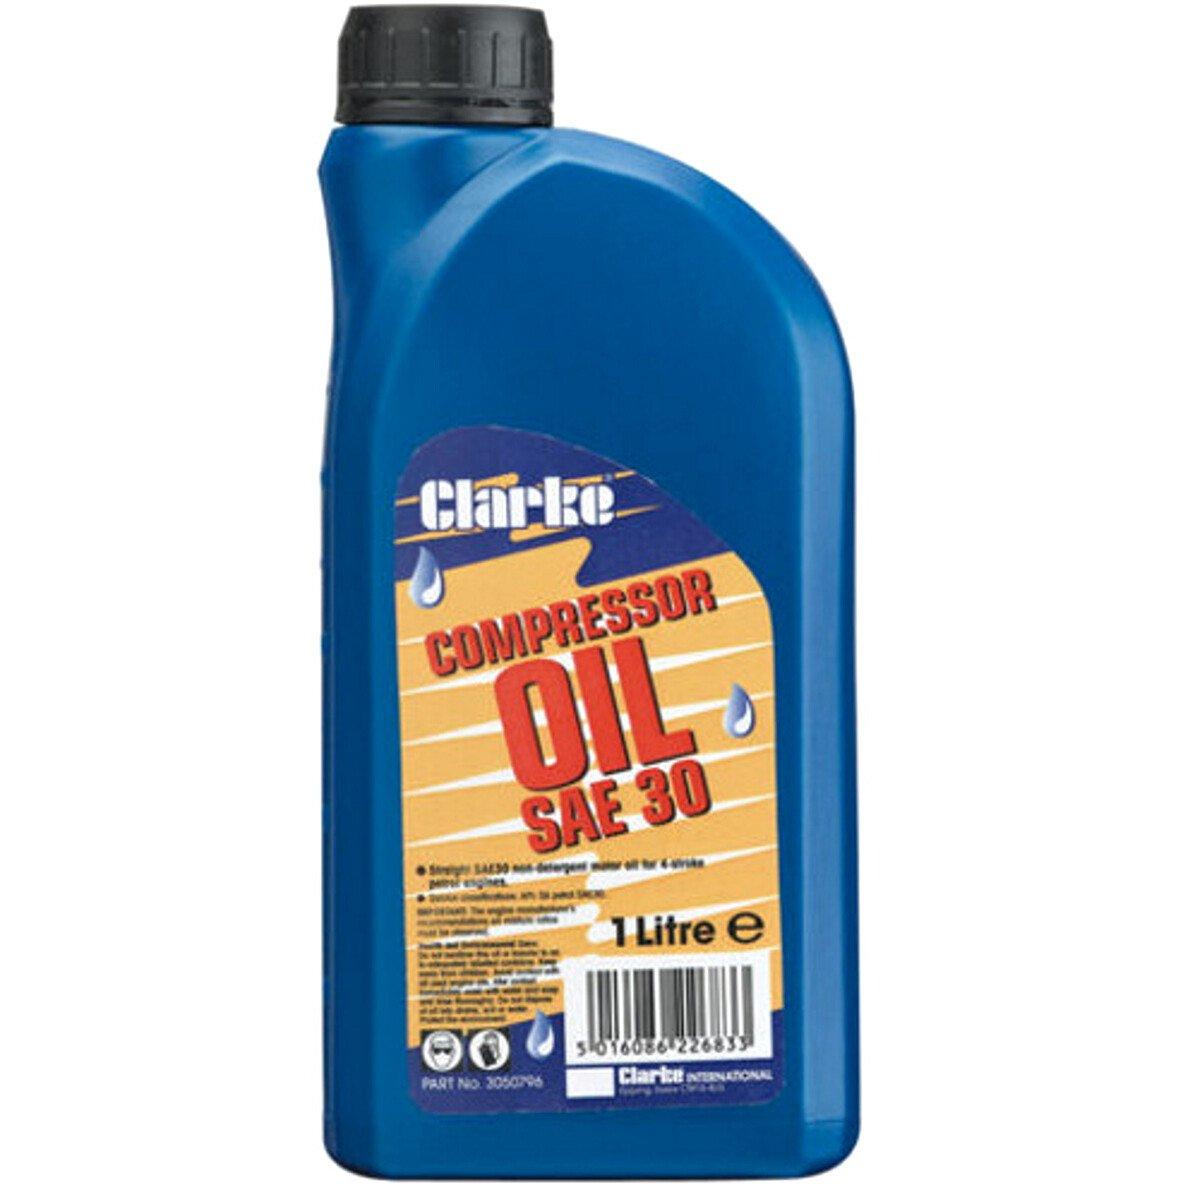 Clarke 3050796 SAE 30 Long Life Compressor Oil 1 Litre